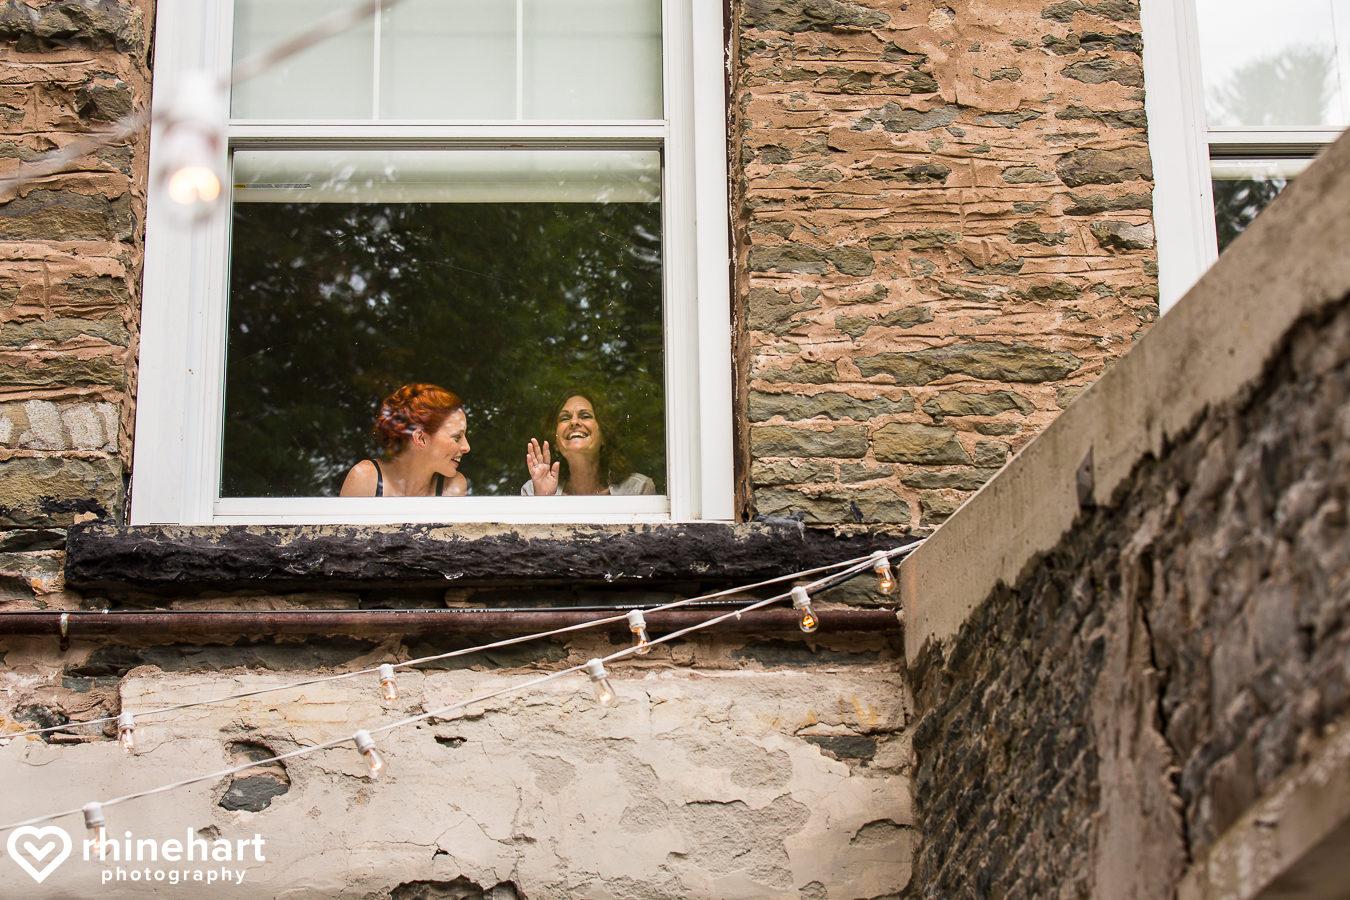 ledges-hotel-wedding-photographers-poconos-hawley-pa-best-creative-unique-artistic-fun-romantic-171